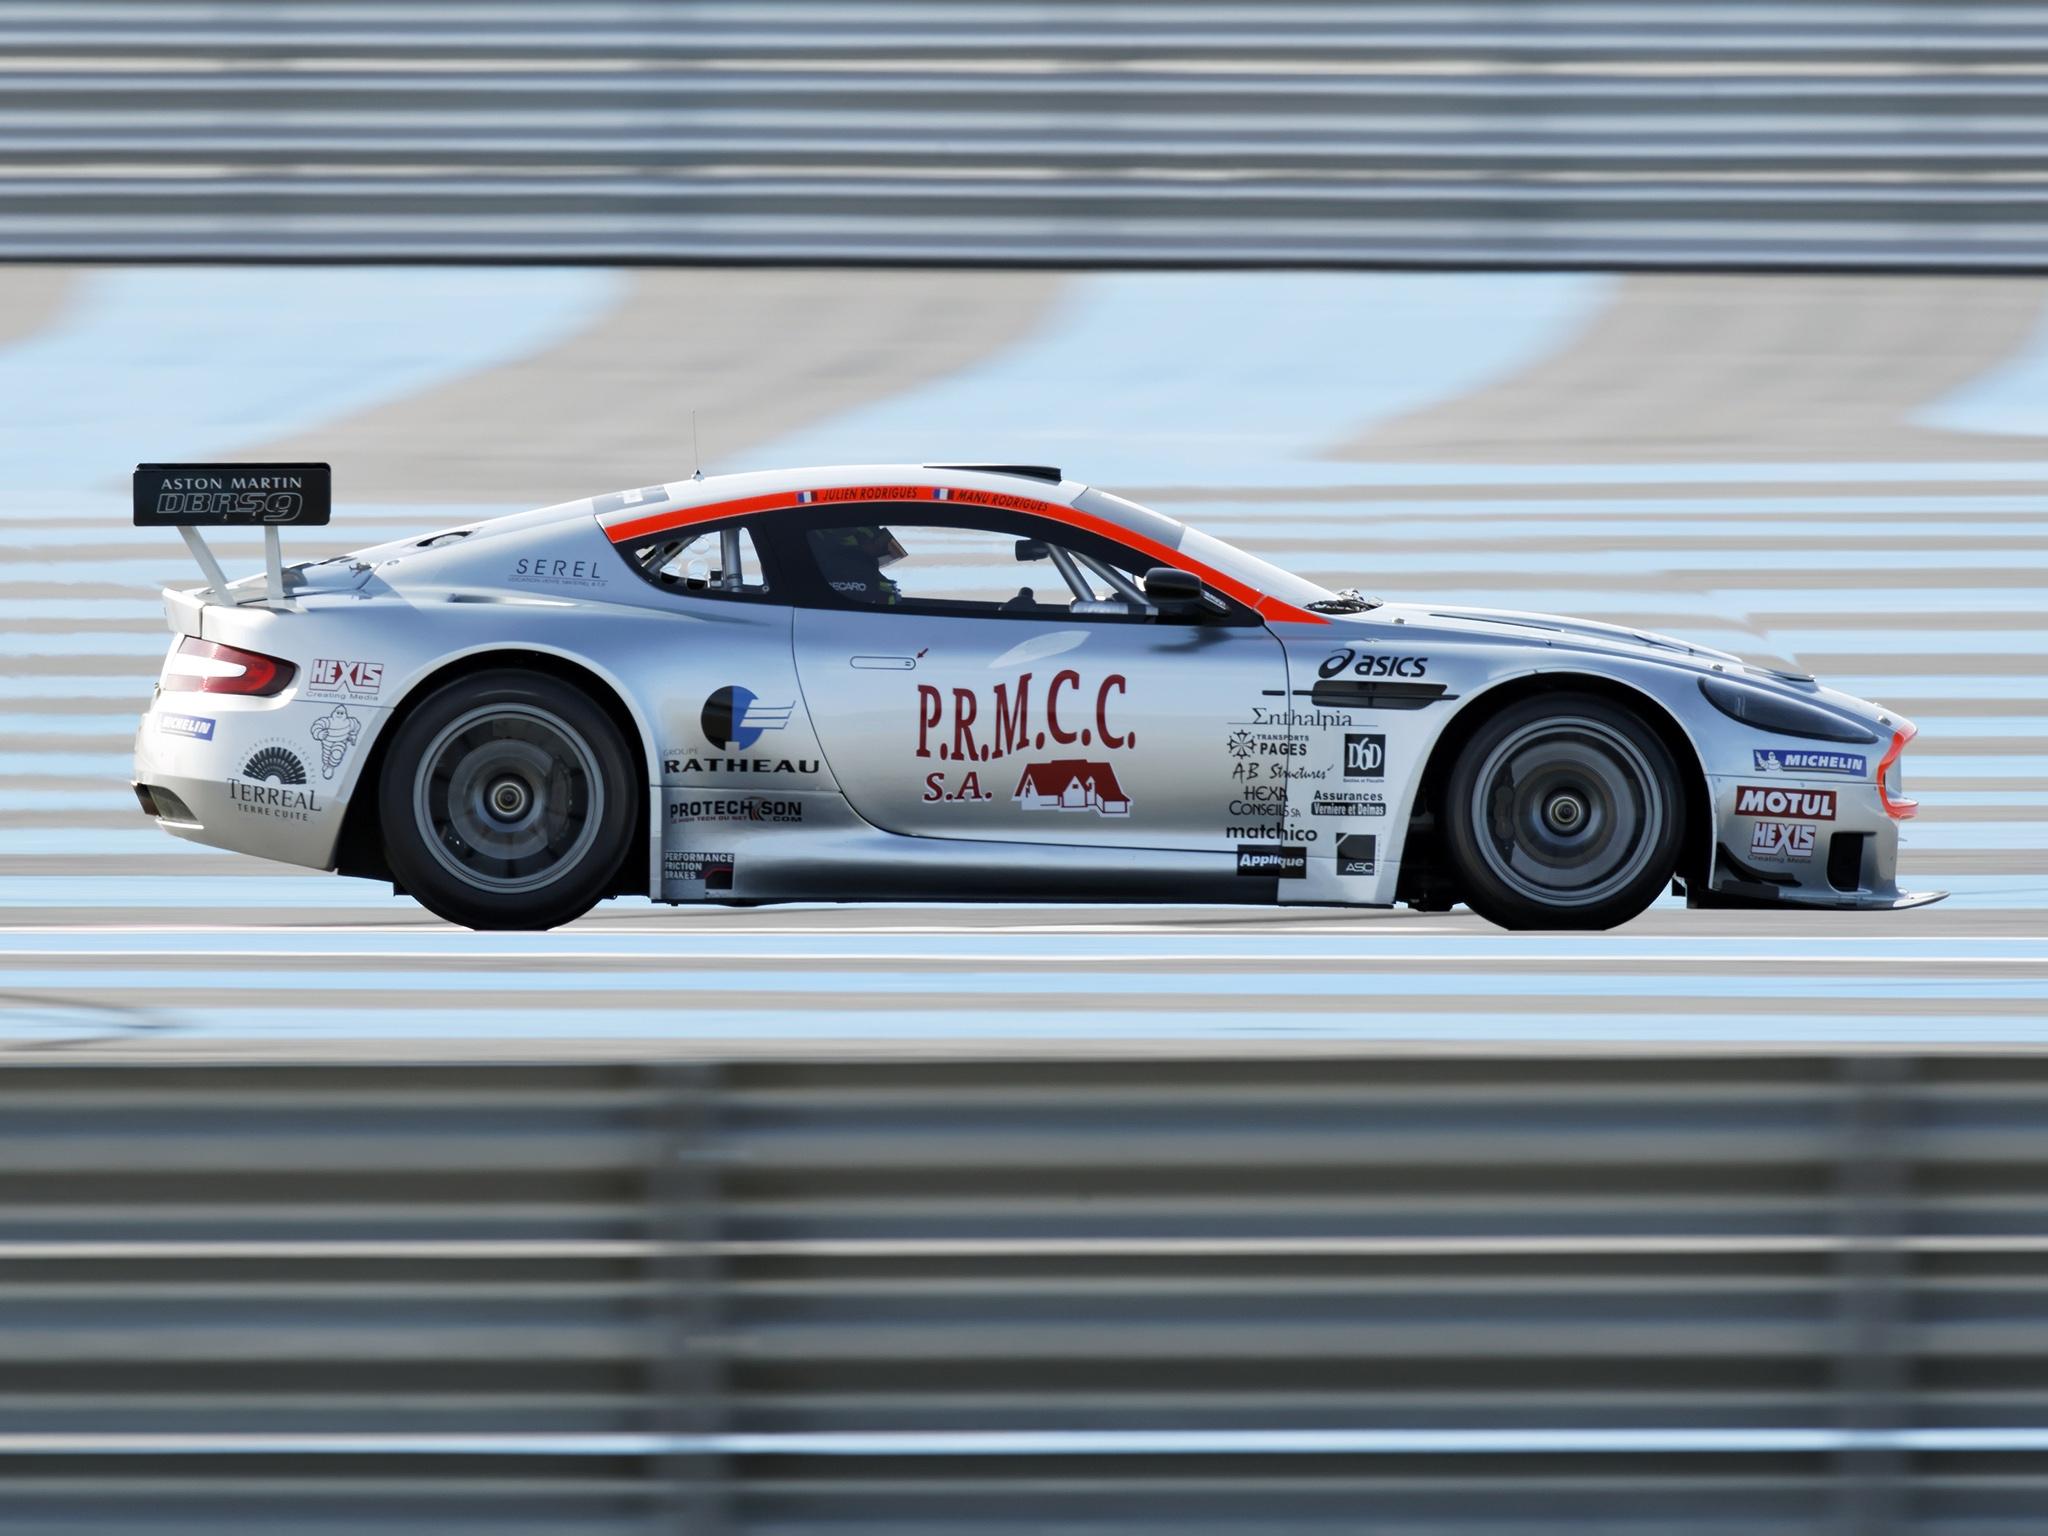 Race Car Side View Wallpaper : whi...